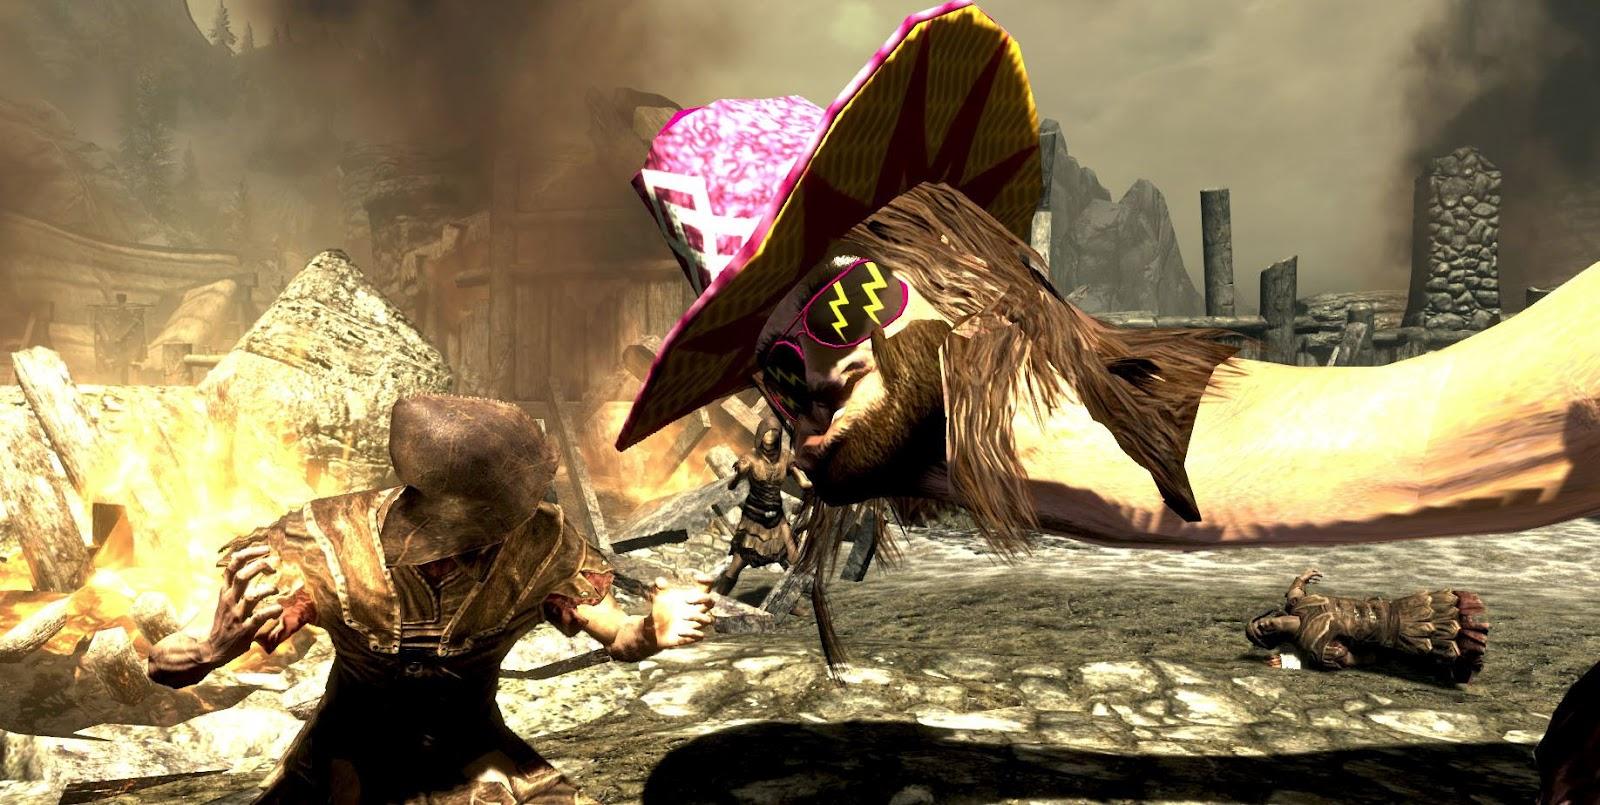 Skyrim macho man randy savage dragon mod download